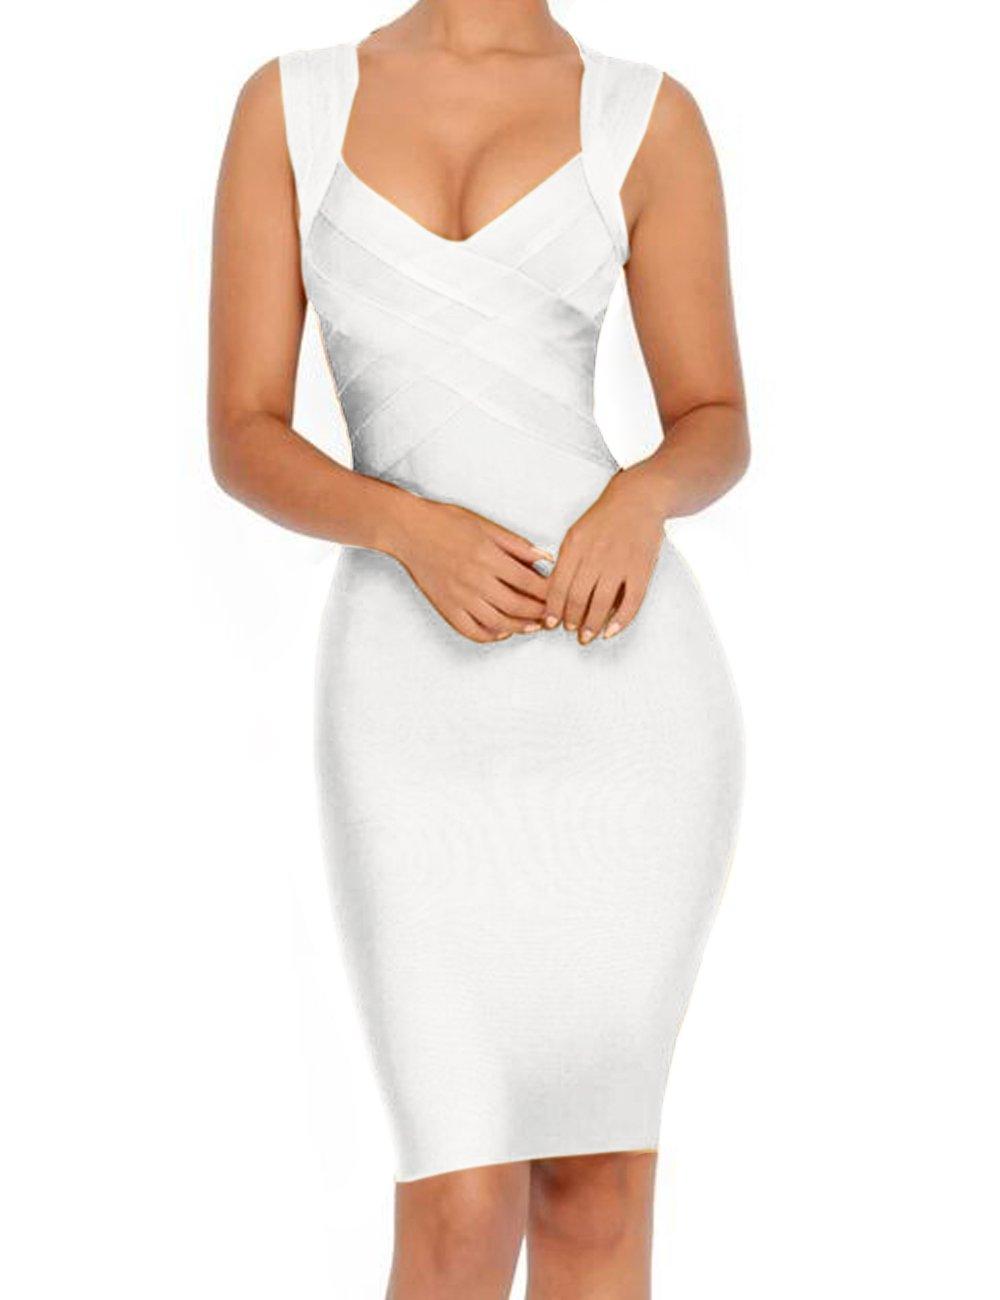 whoinshop Women's V-Neck Strapless Clubwear Bodycon